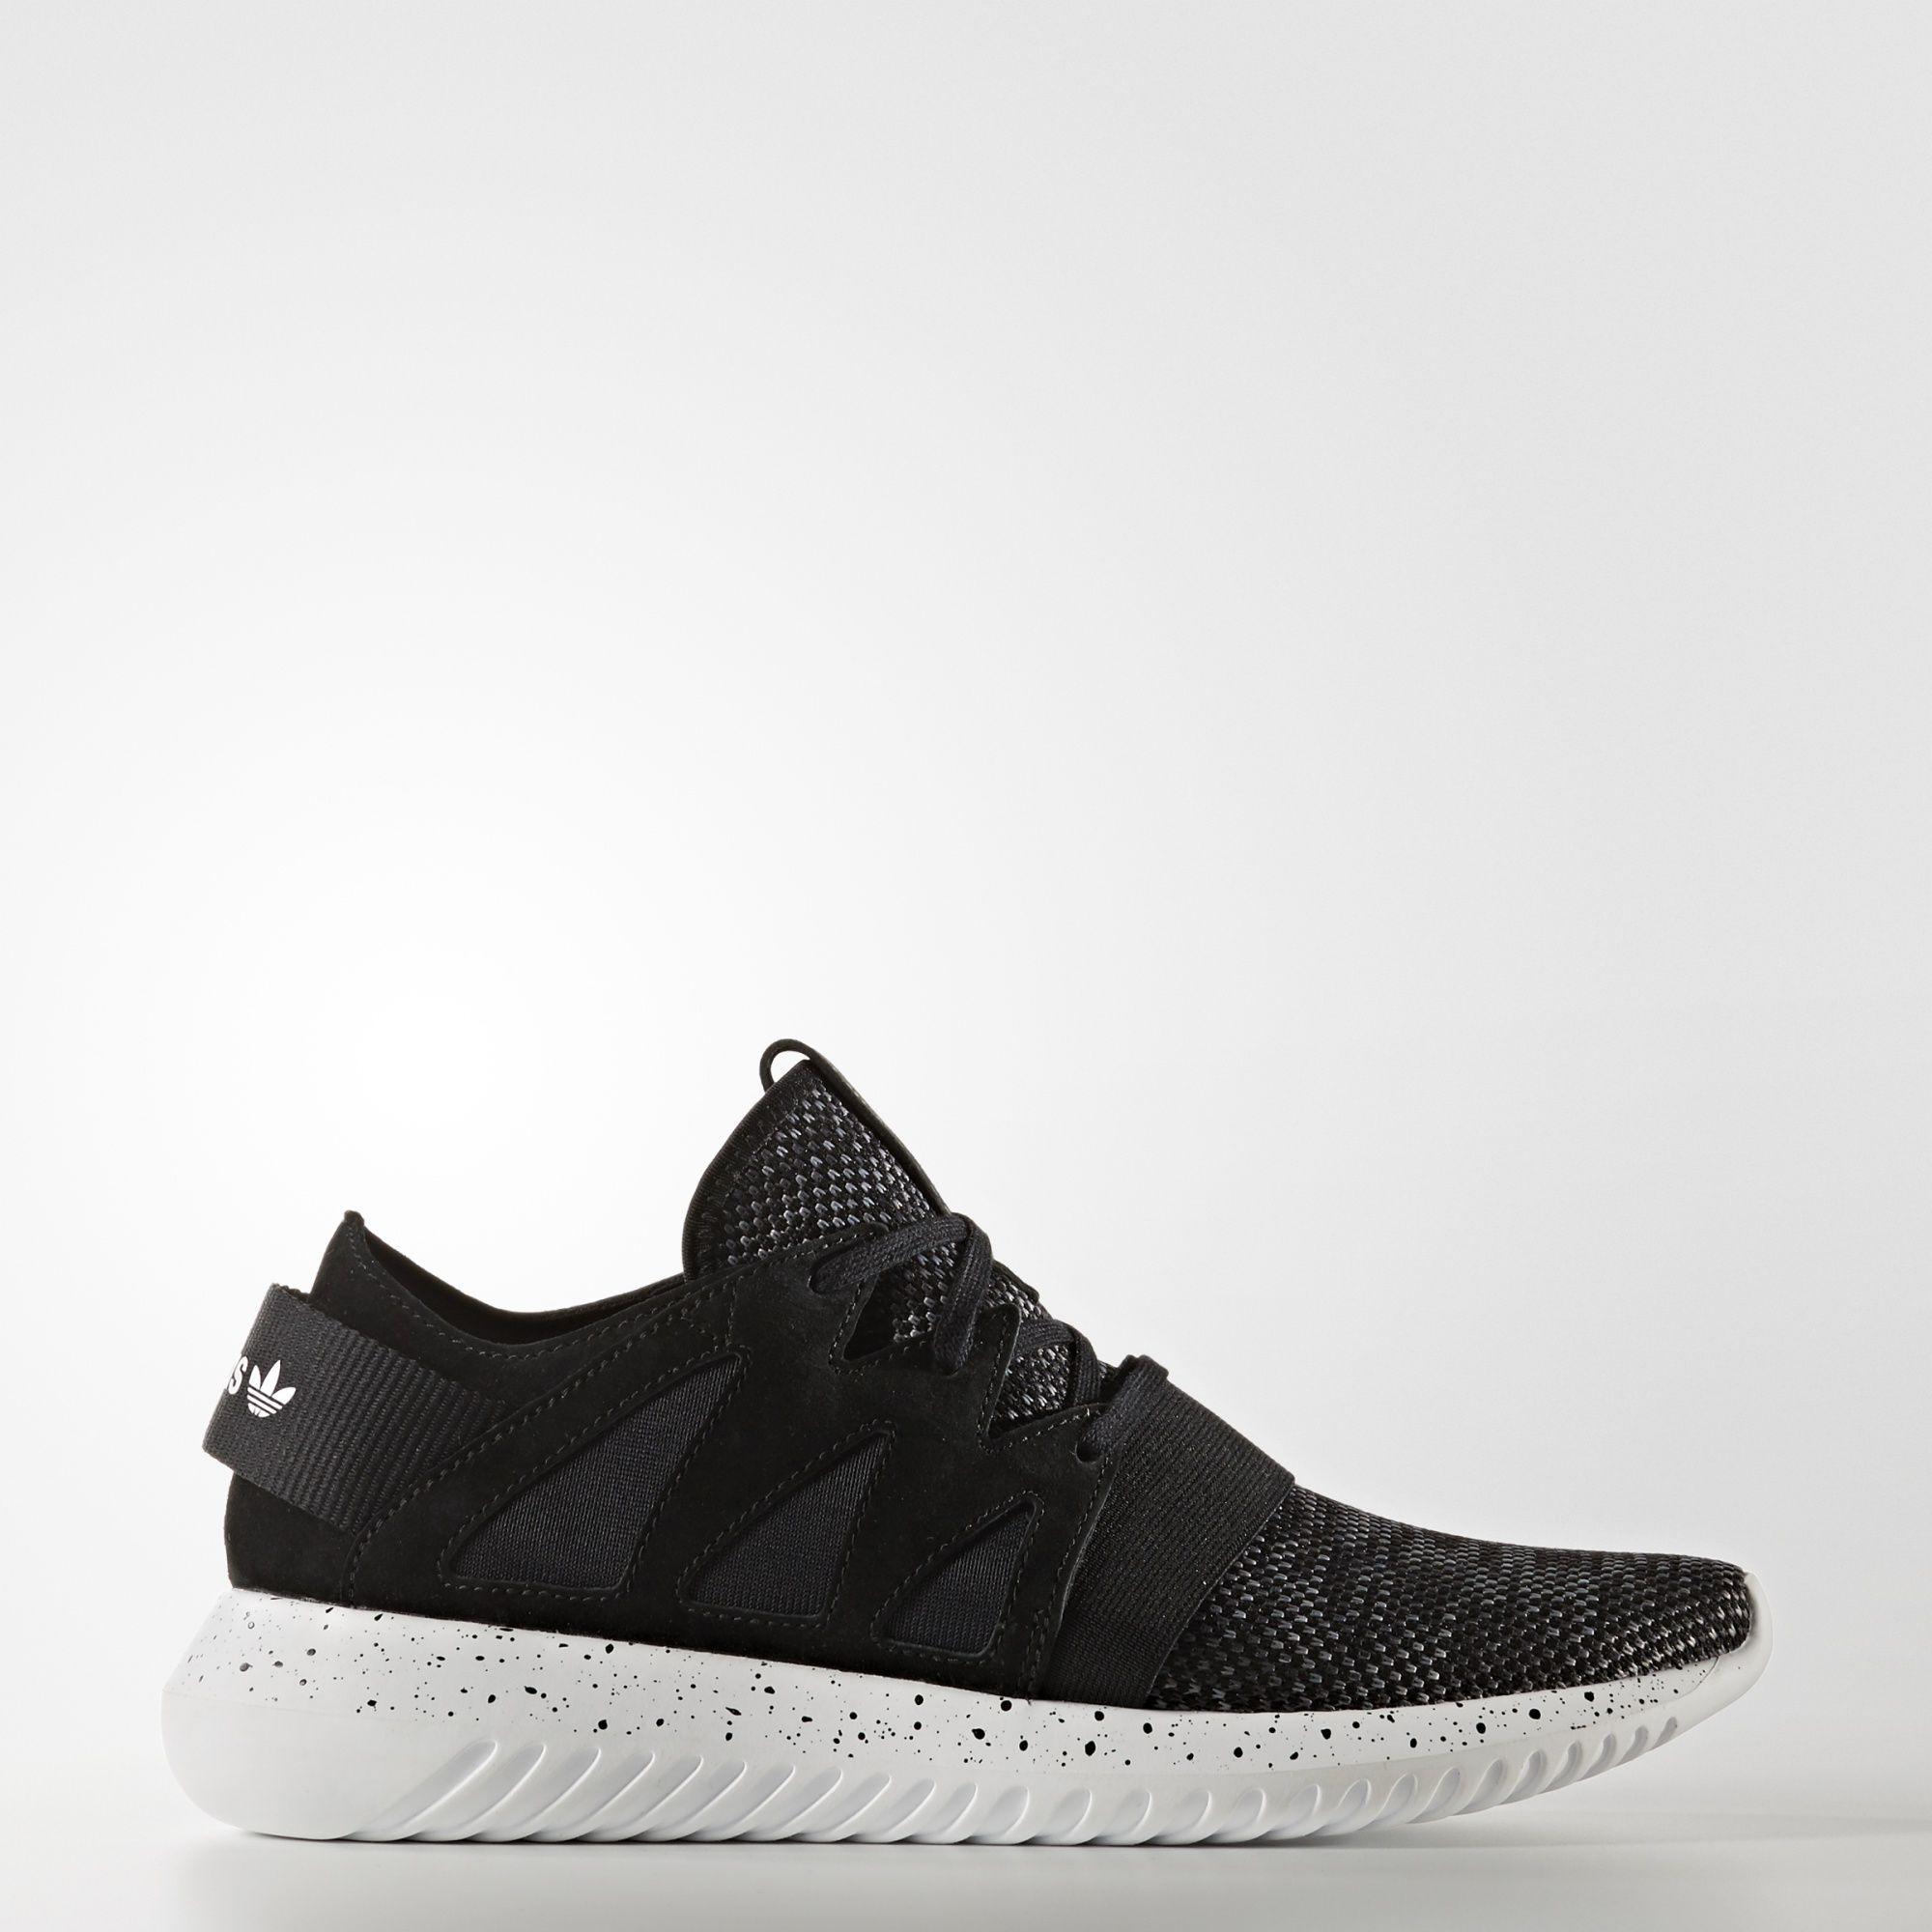 adidas SST Slip-On Schoenen - zwart | adidas Nederland | style | Pinterest  | Adidas and Shopping